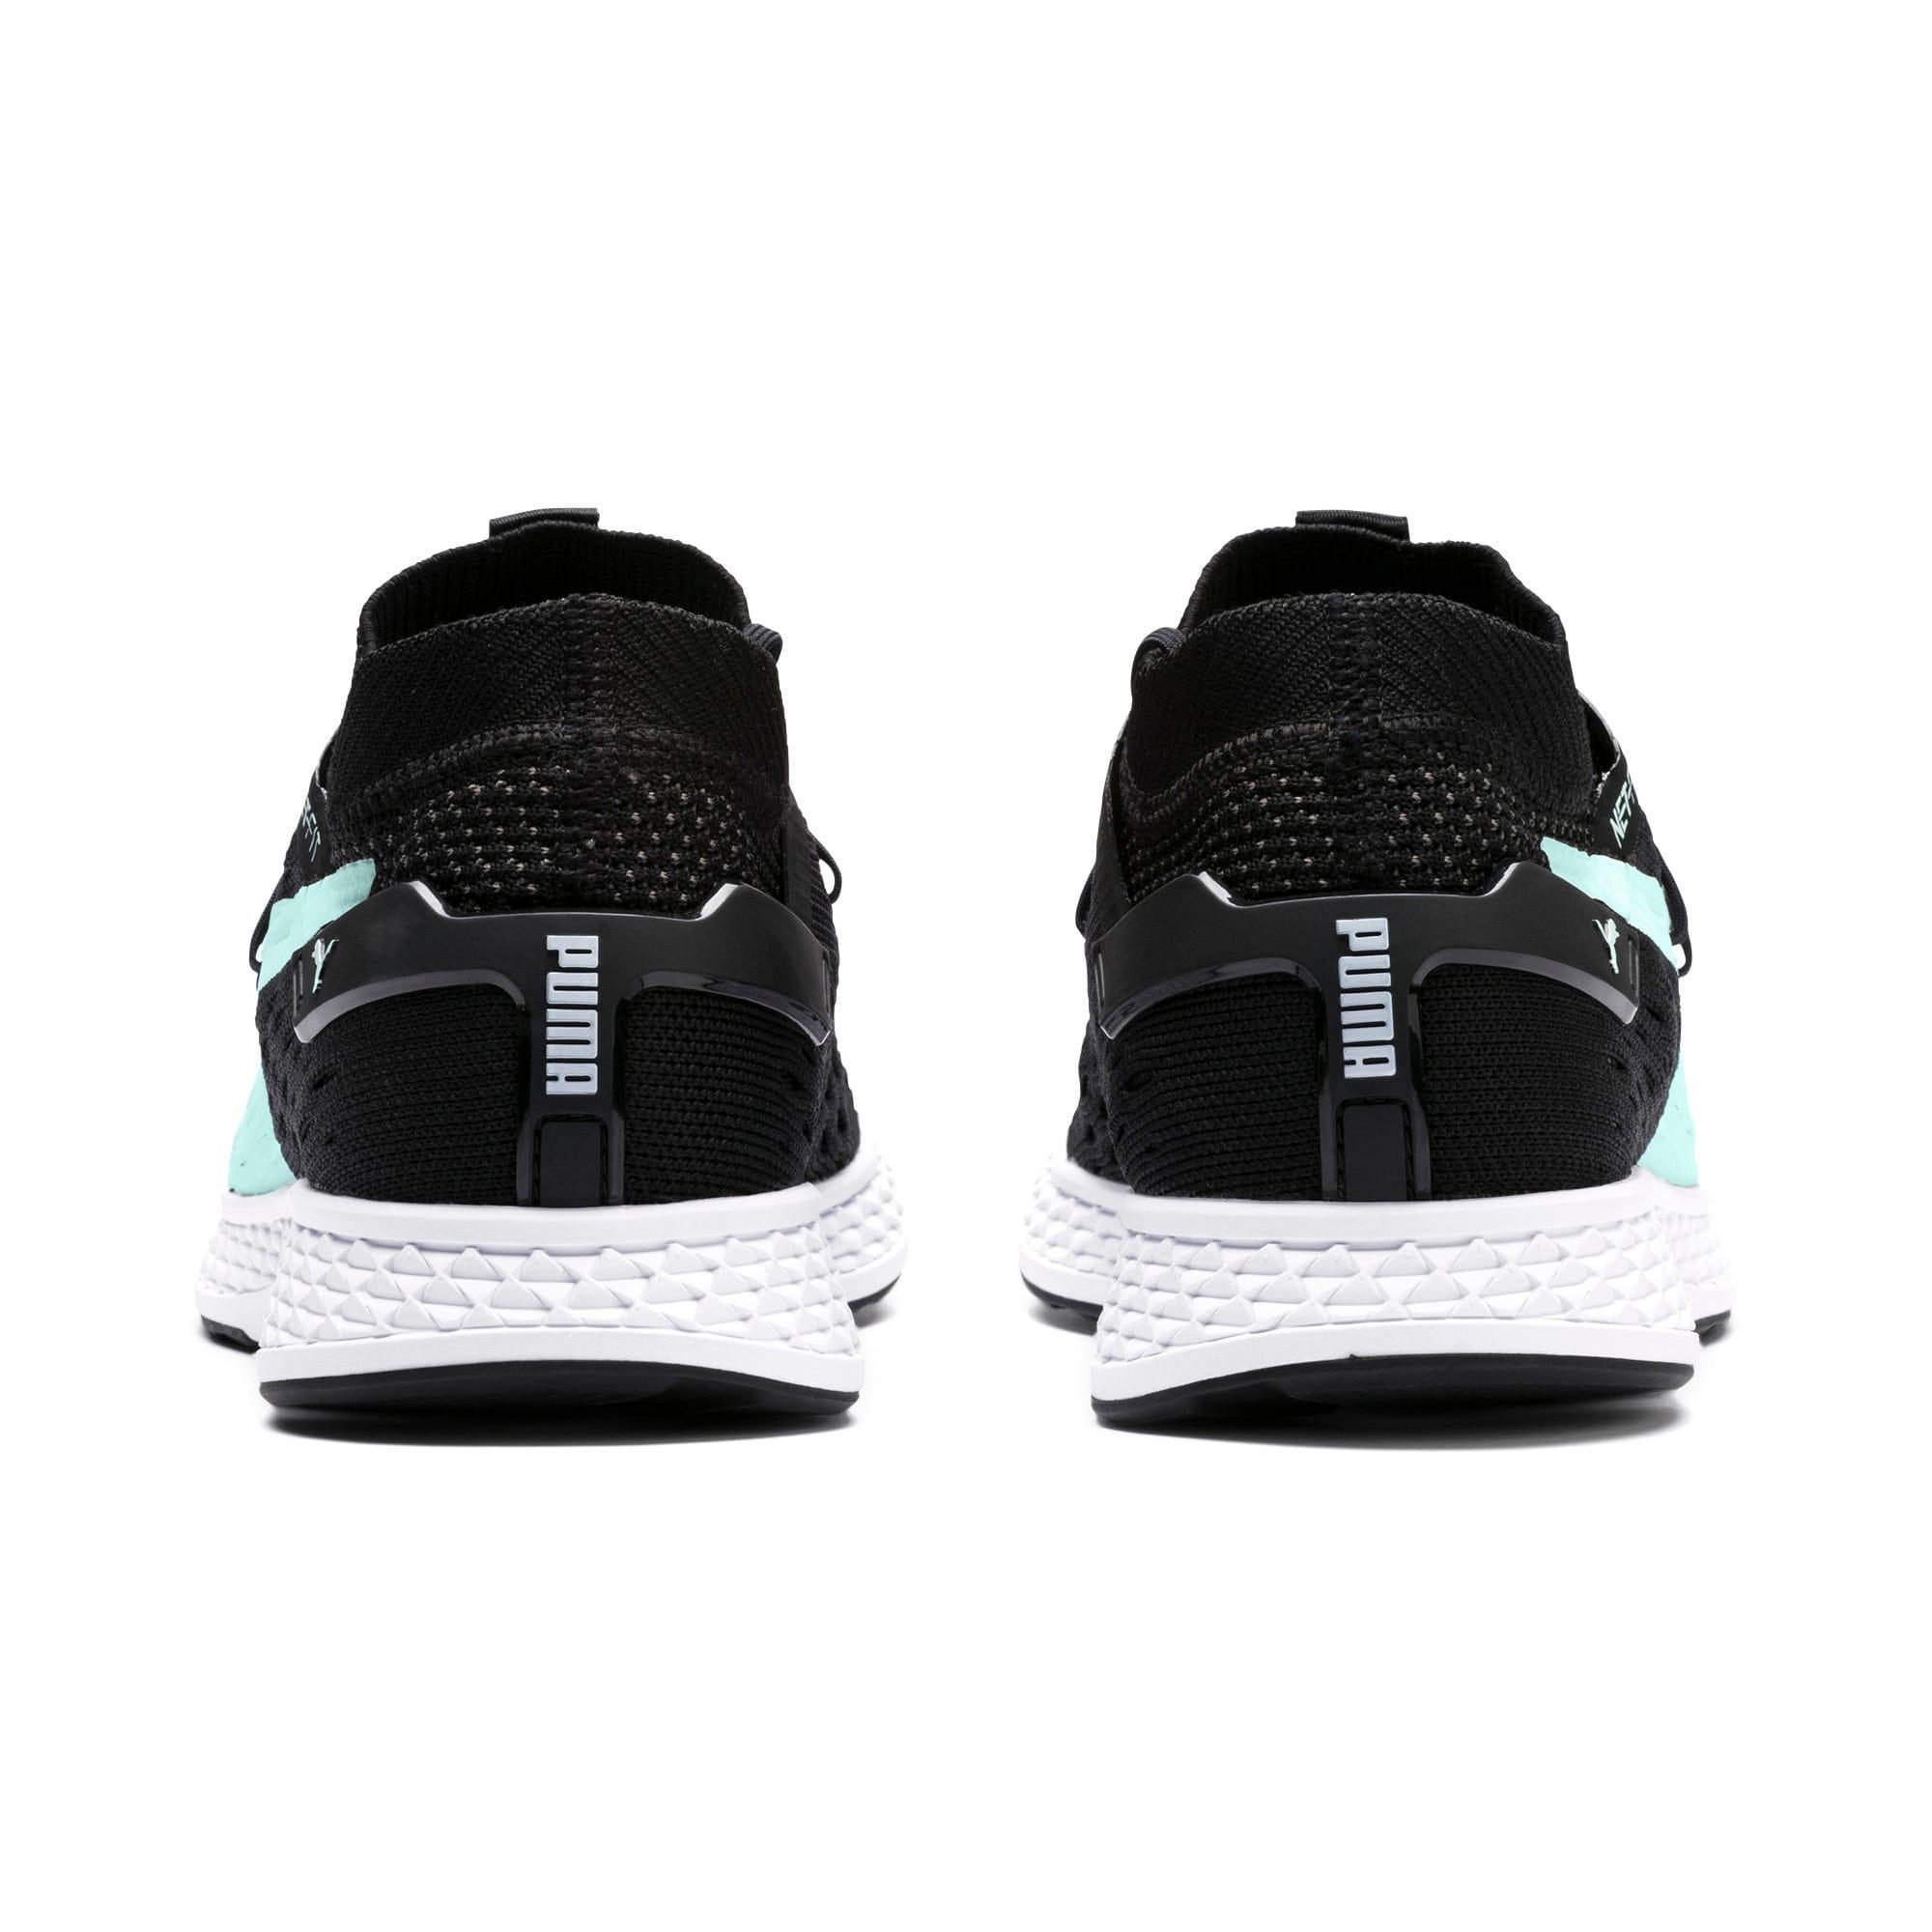 Thumbnail 4 of SPEED 500 Women's Running Shoes, Puma Black-Puma White, medium